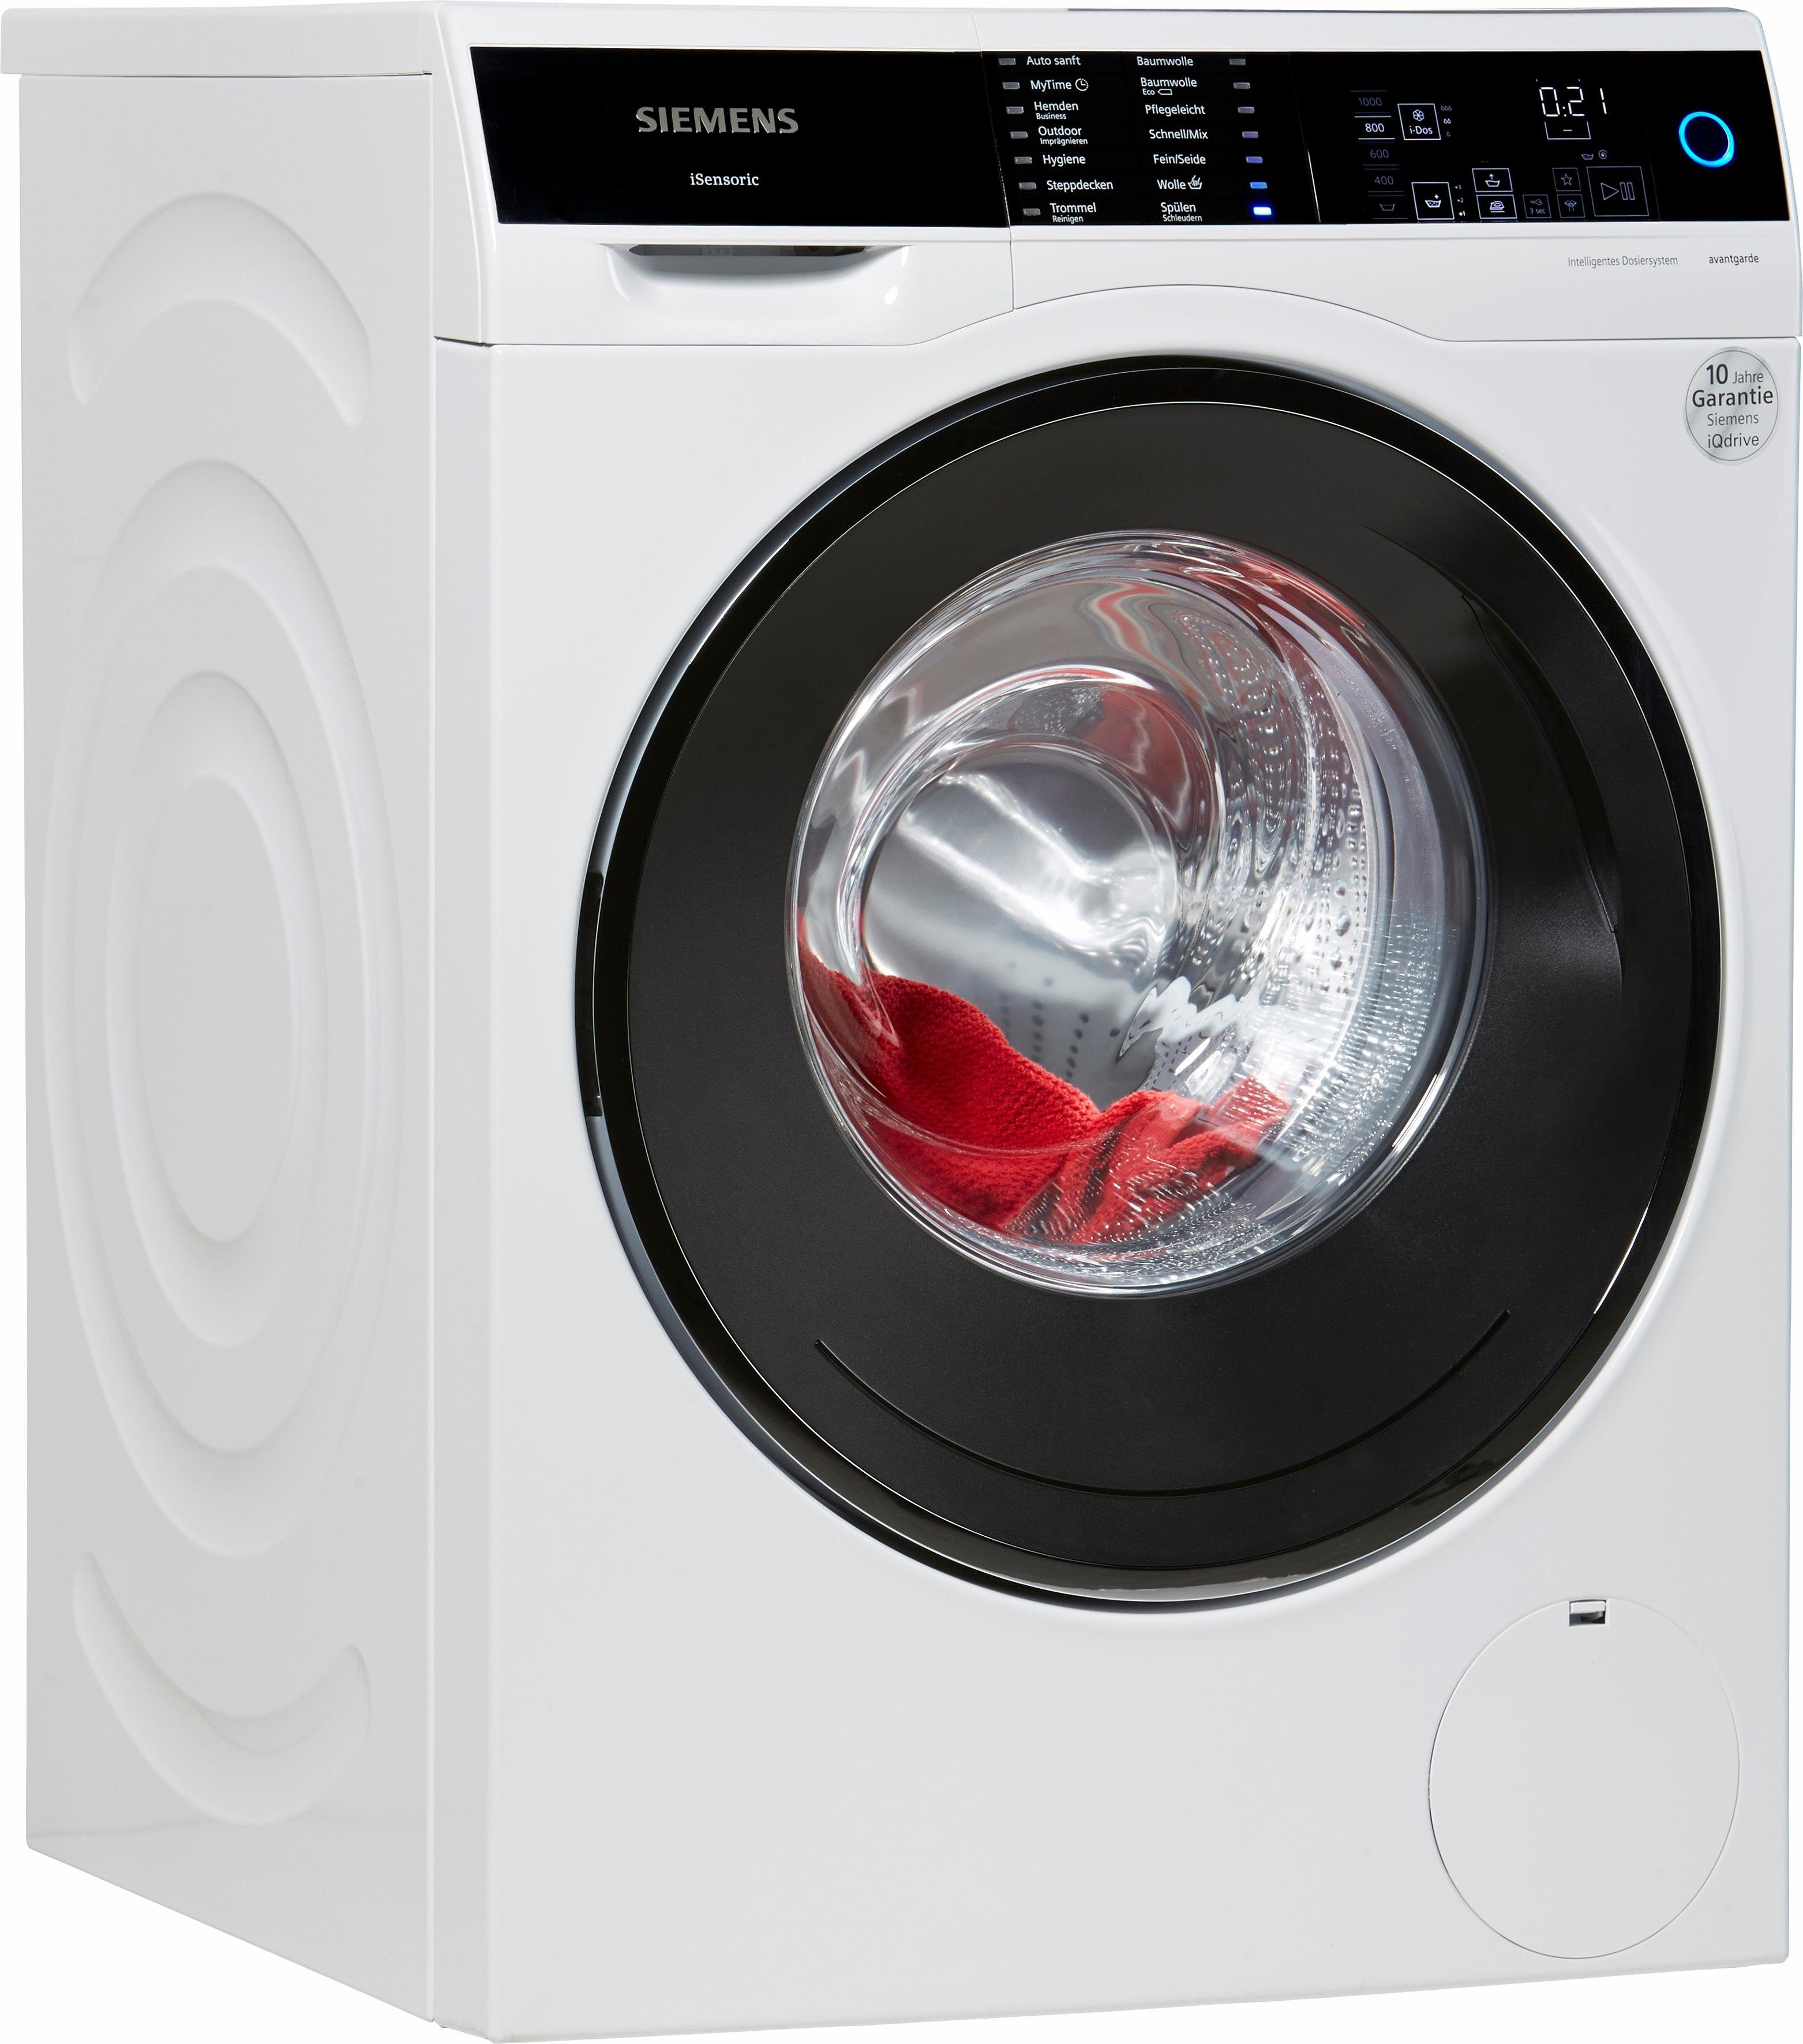 SIEMENS Waschmaschine avantgarde WM14U640, A+++, 9 kg, 1400 U/Min